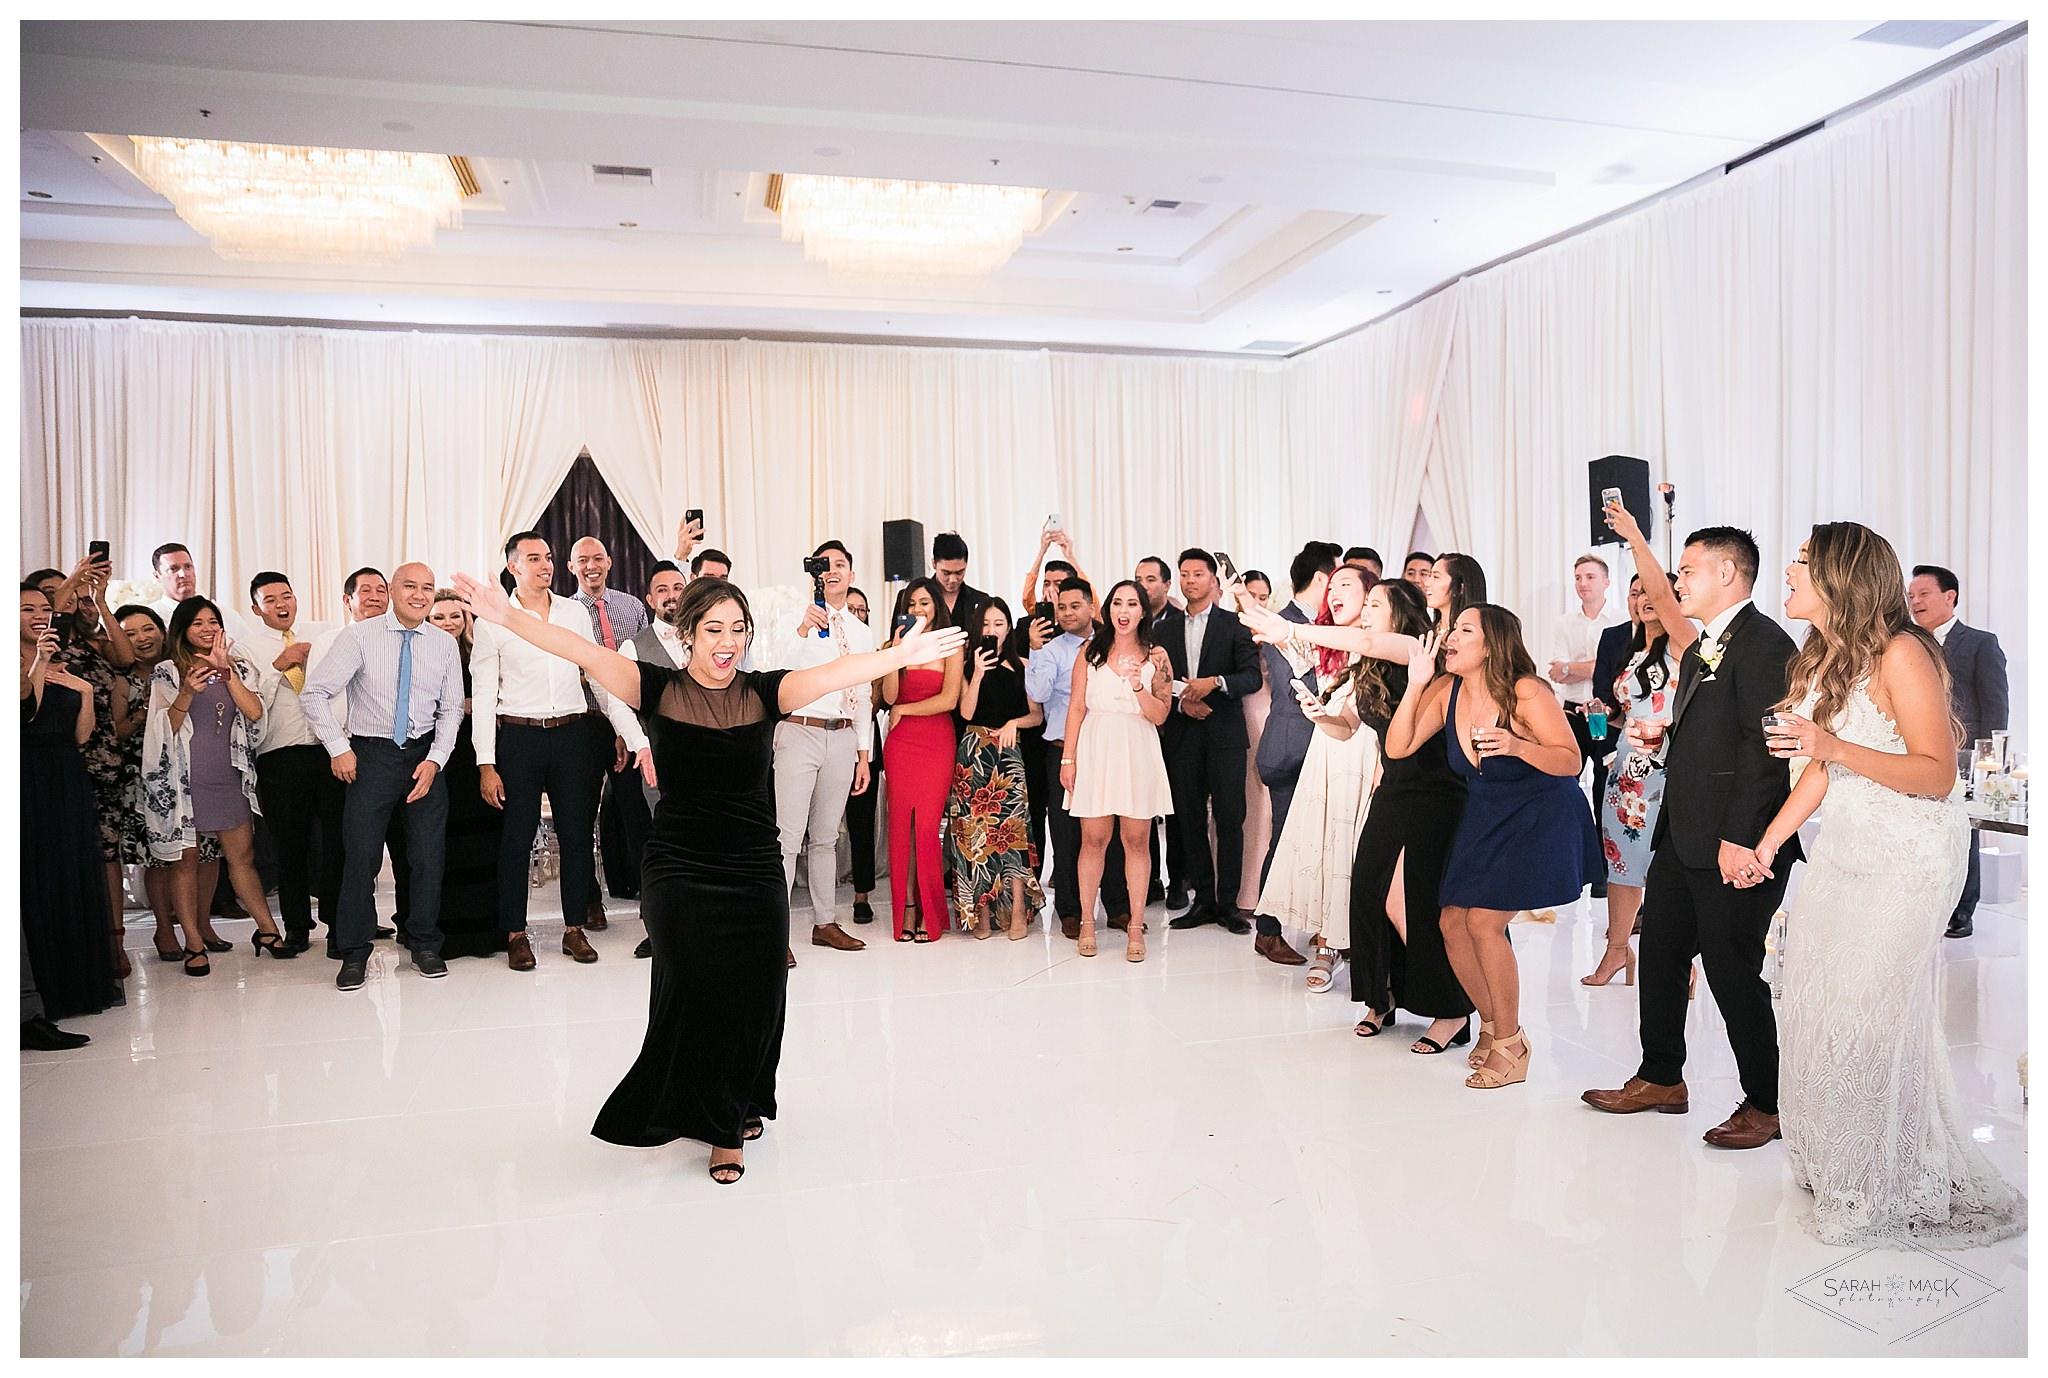 LE-Avenue-of-the-Arts-Costa-Mesa-Wedding-Photography-0215.jpg